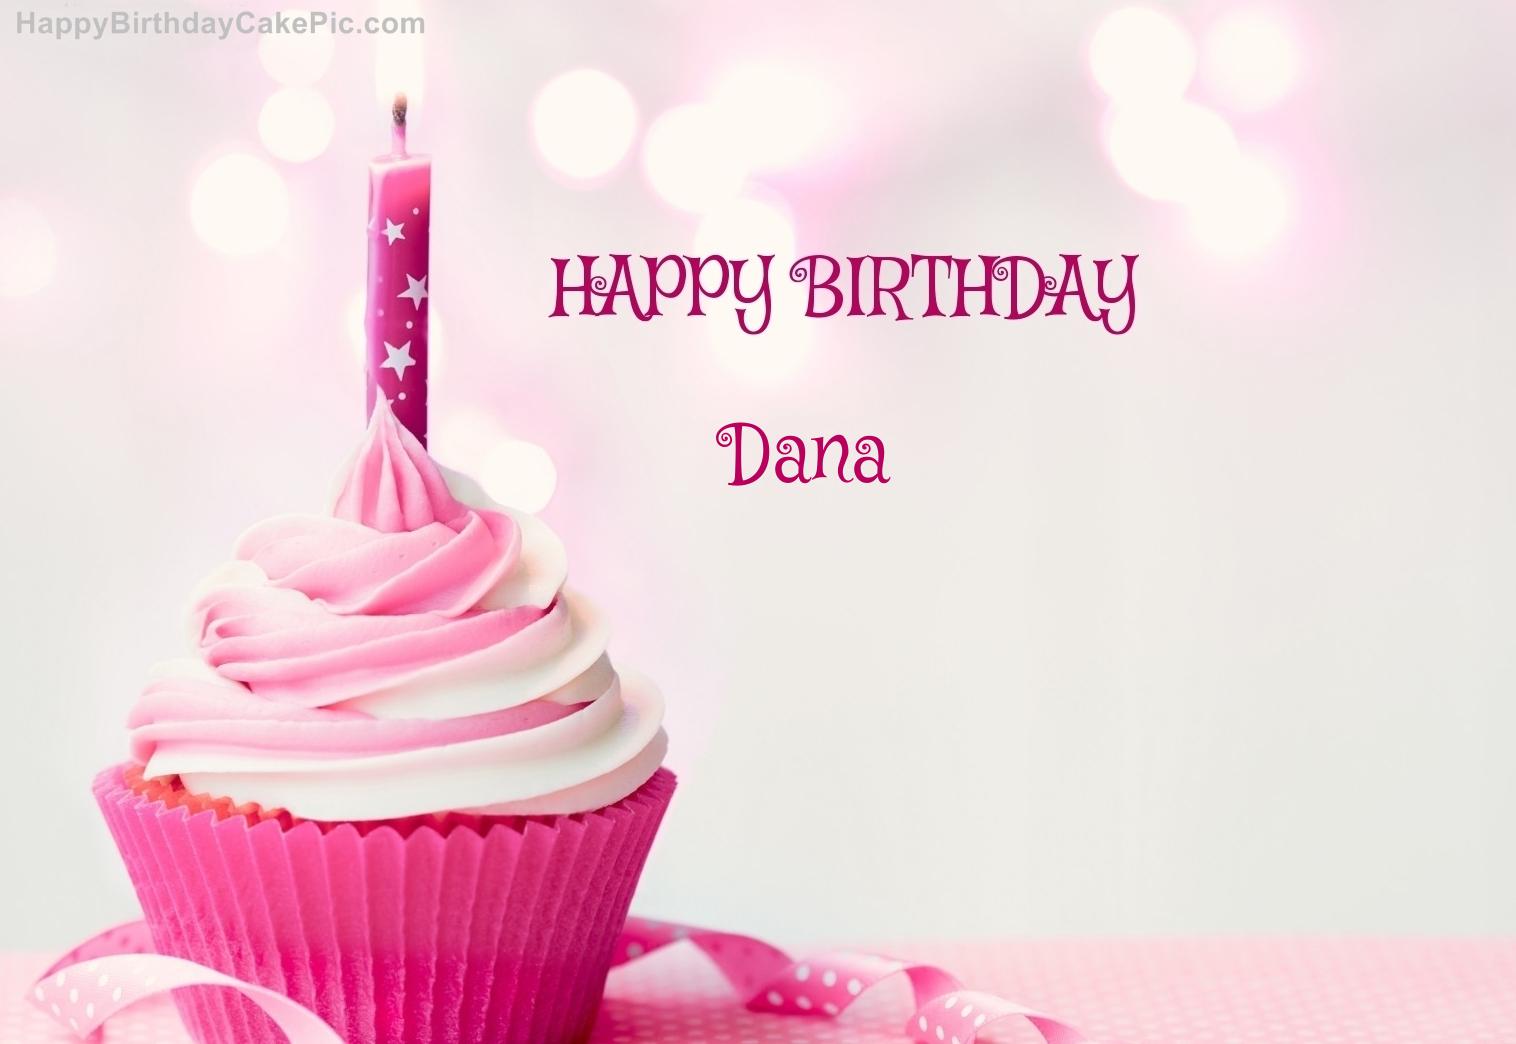 Happy Birthday Cupcake Candle Pink Cake For Dana